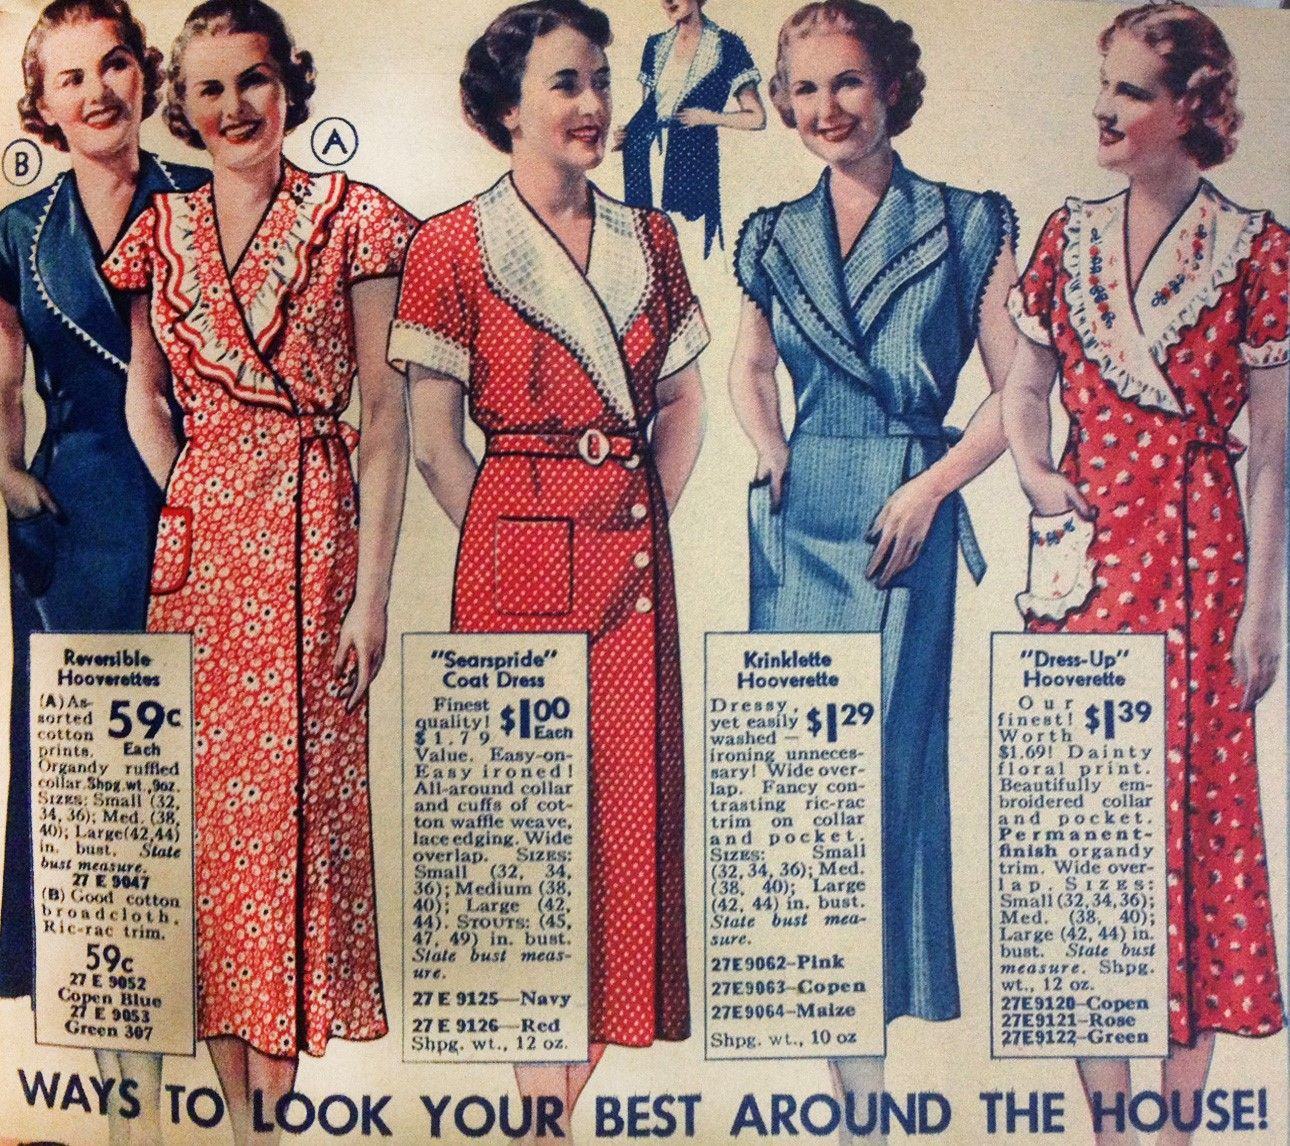 1930s House Dresses Fabrics Patterns Vintage 1930s Dress 1930s Fashion House Dress